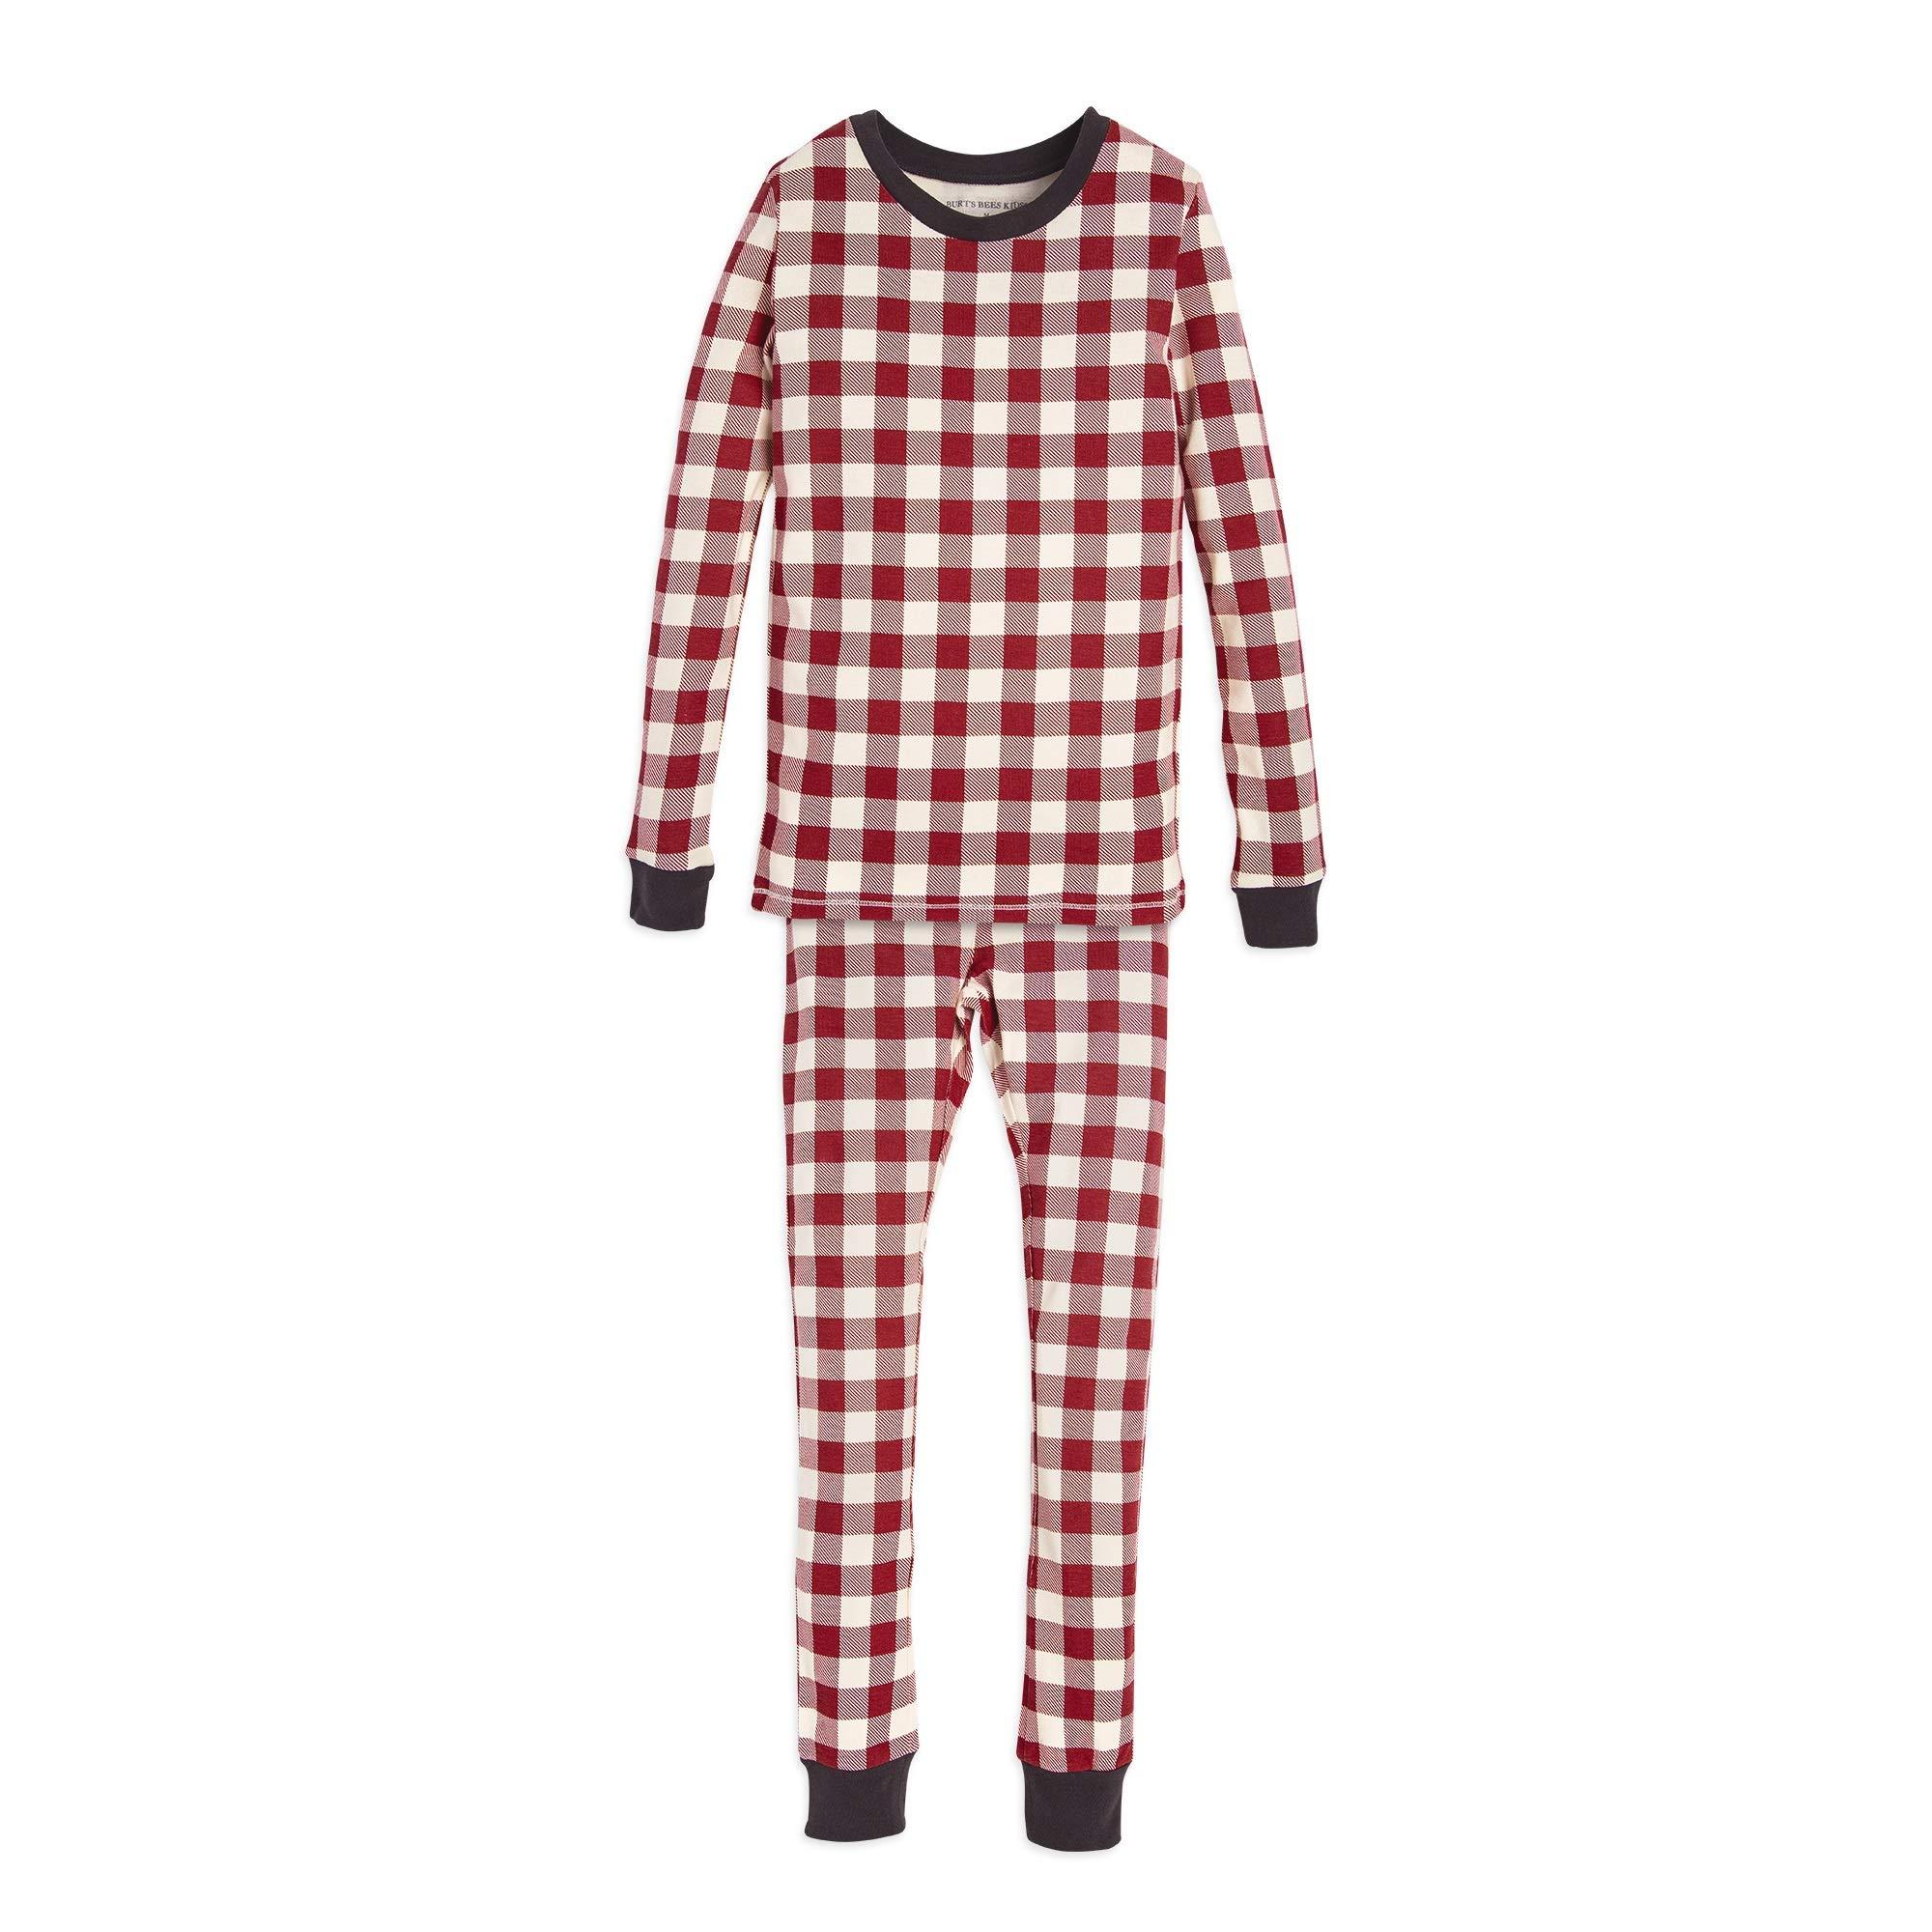 Burt's Bees Baby Big Family Jammies, Holiday Matching Pajamas, Buffalo Check Cranberry, Kids X-Small (4/5)